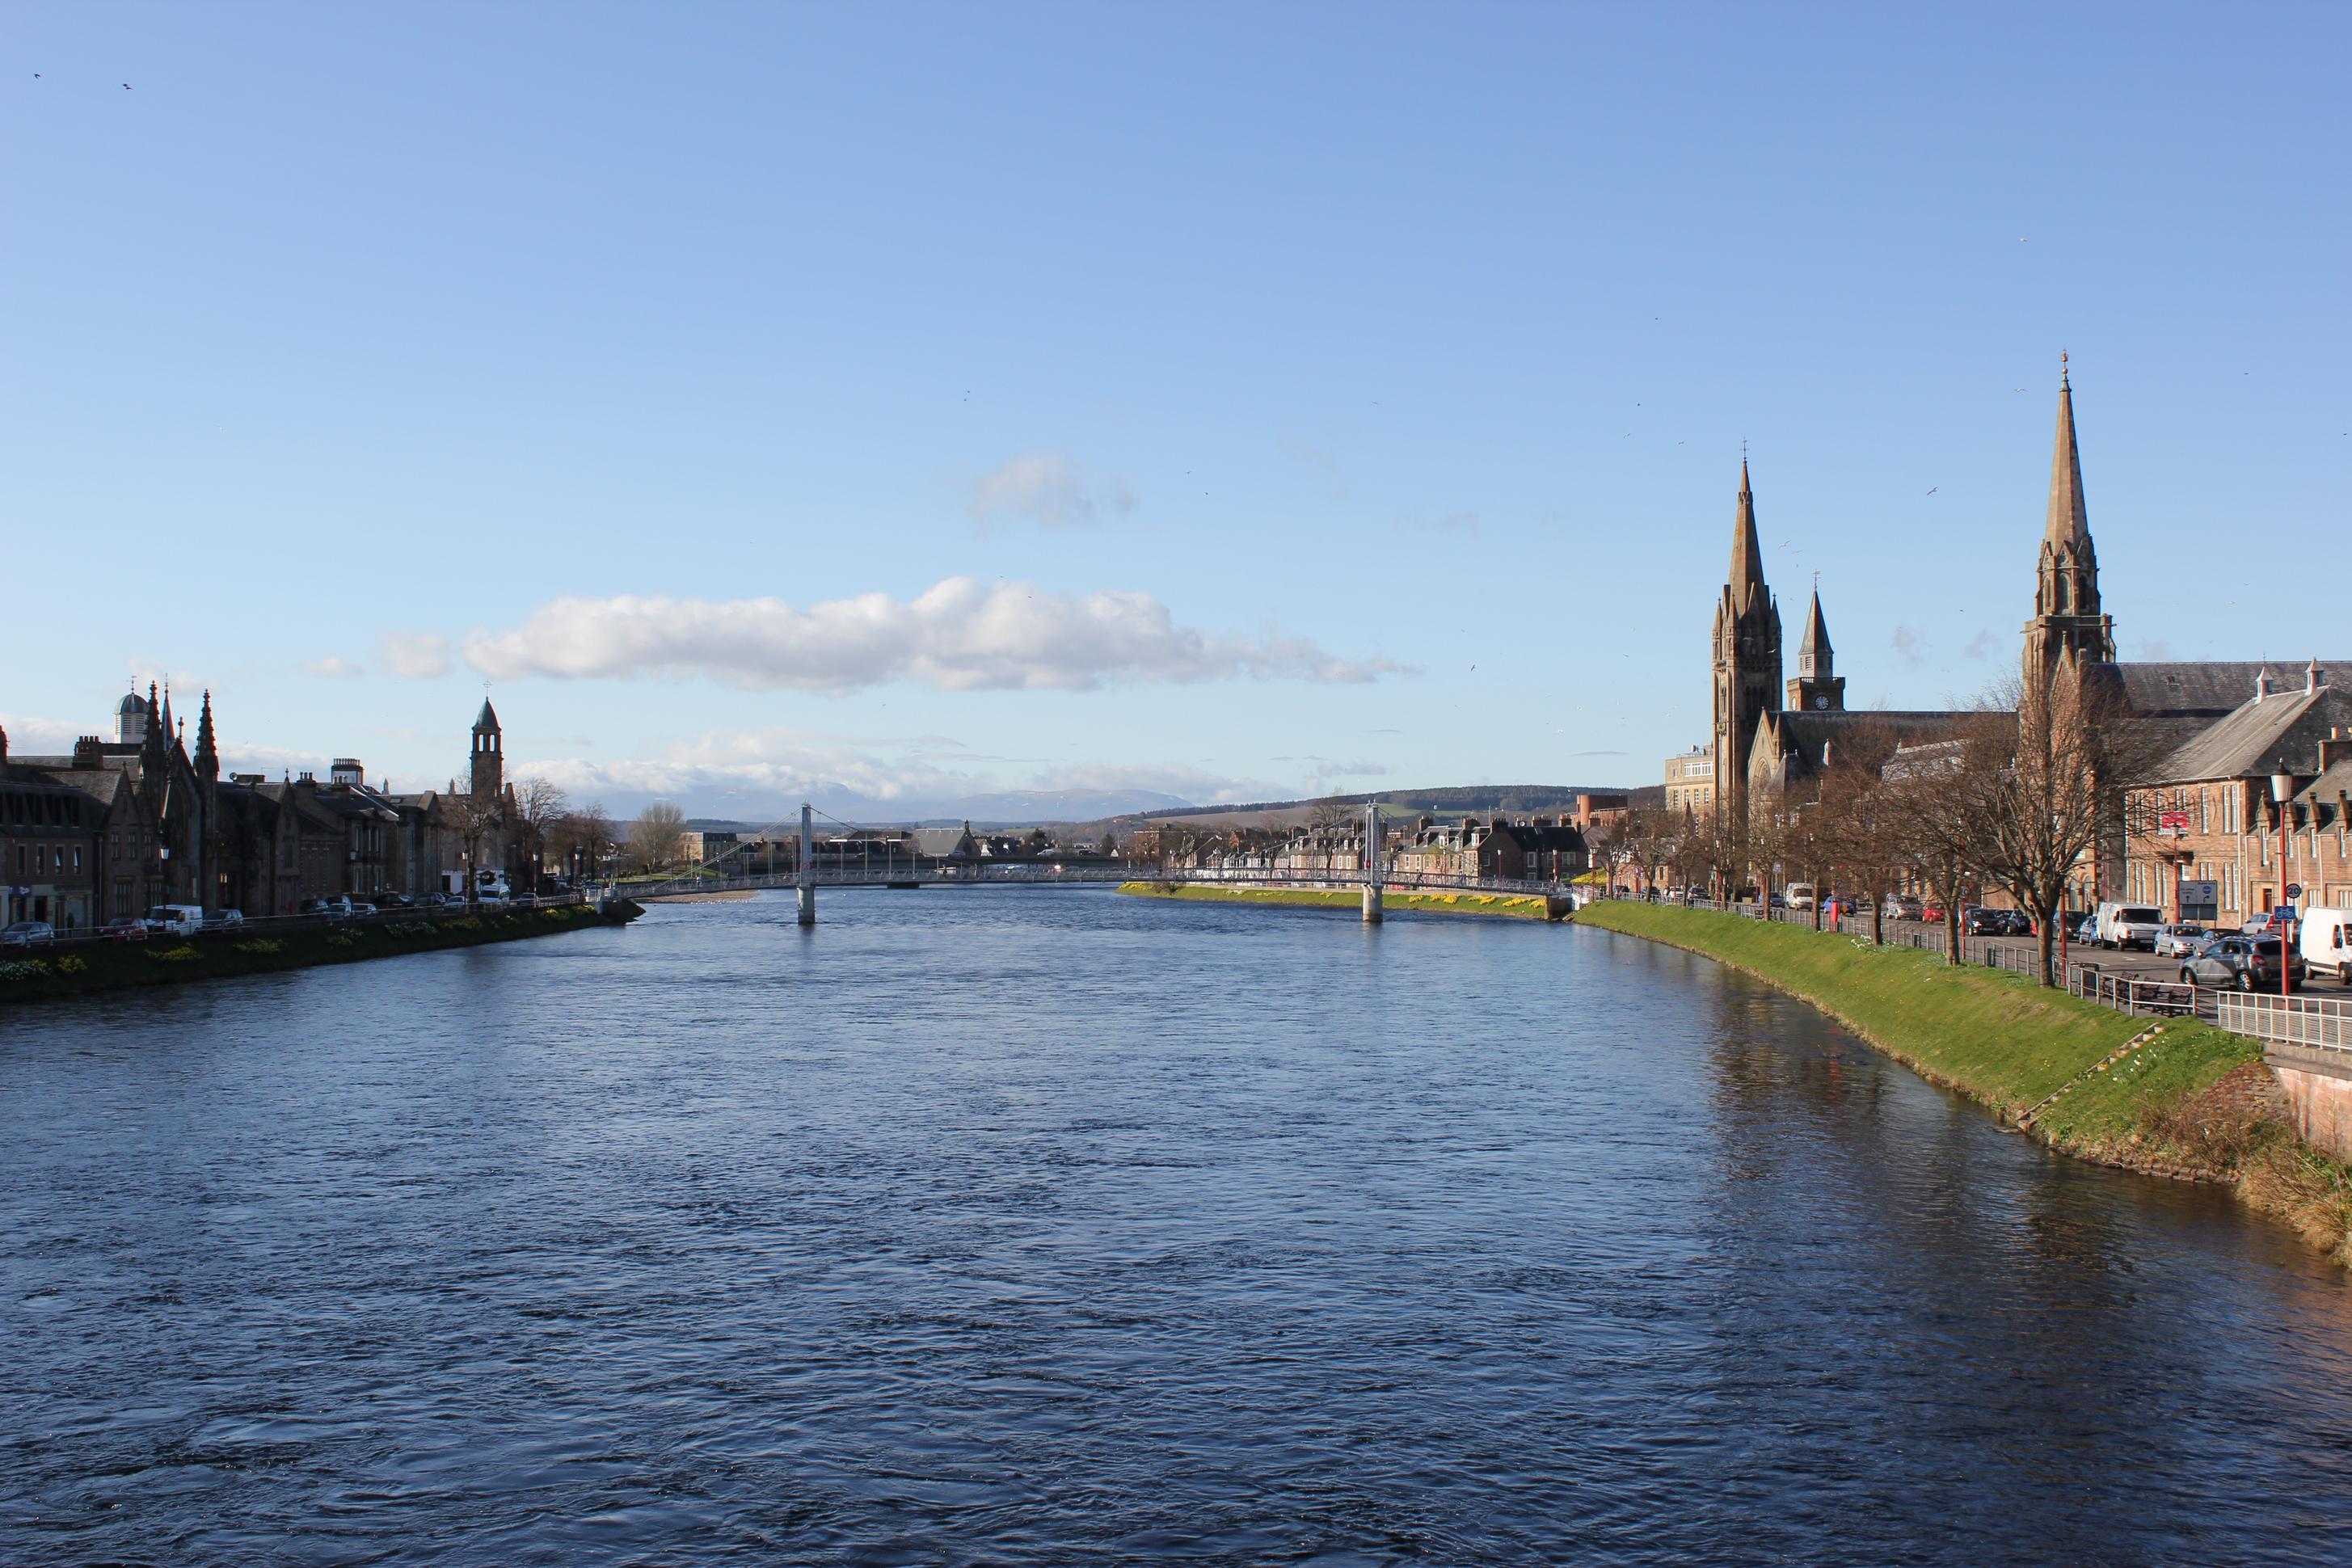 File:Schottland Inverness.JPG - Wikimedia Commons